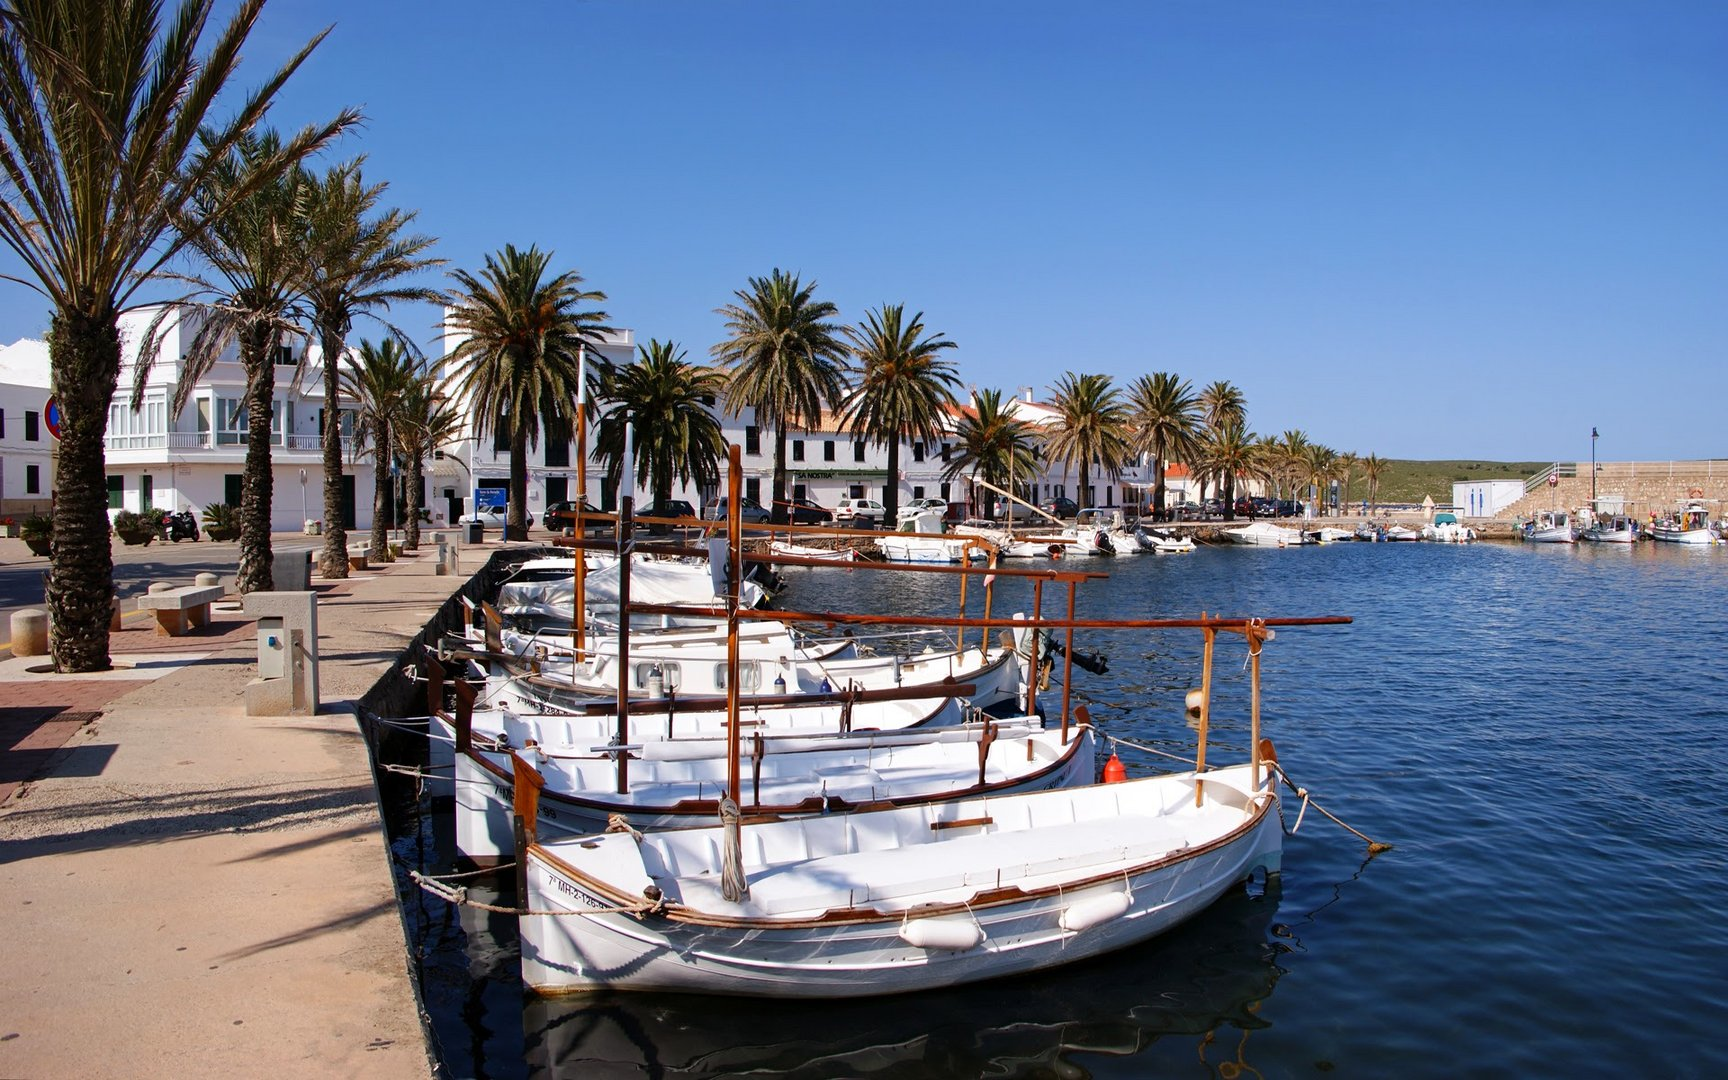 Fornells / Menorca